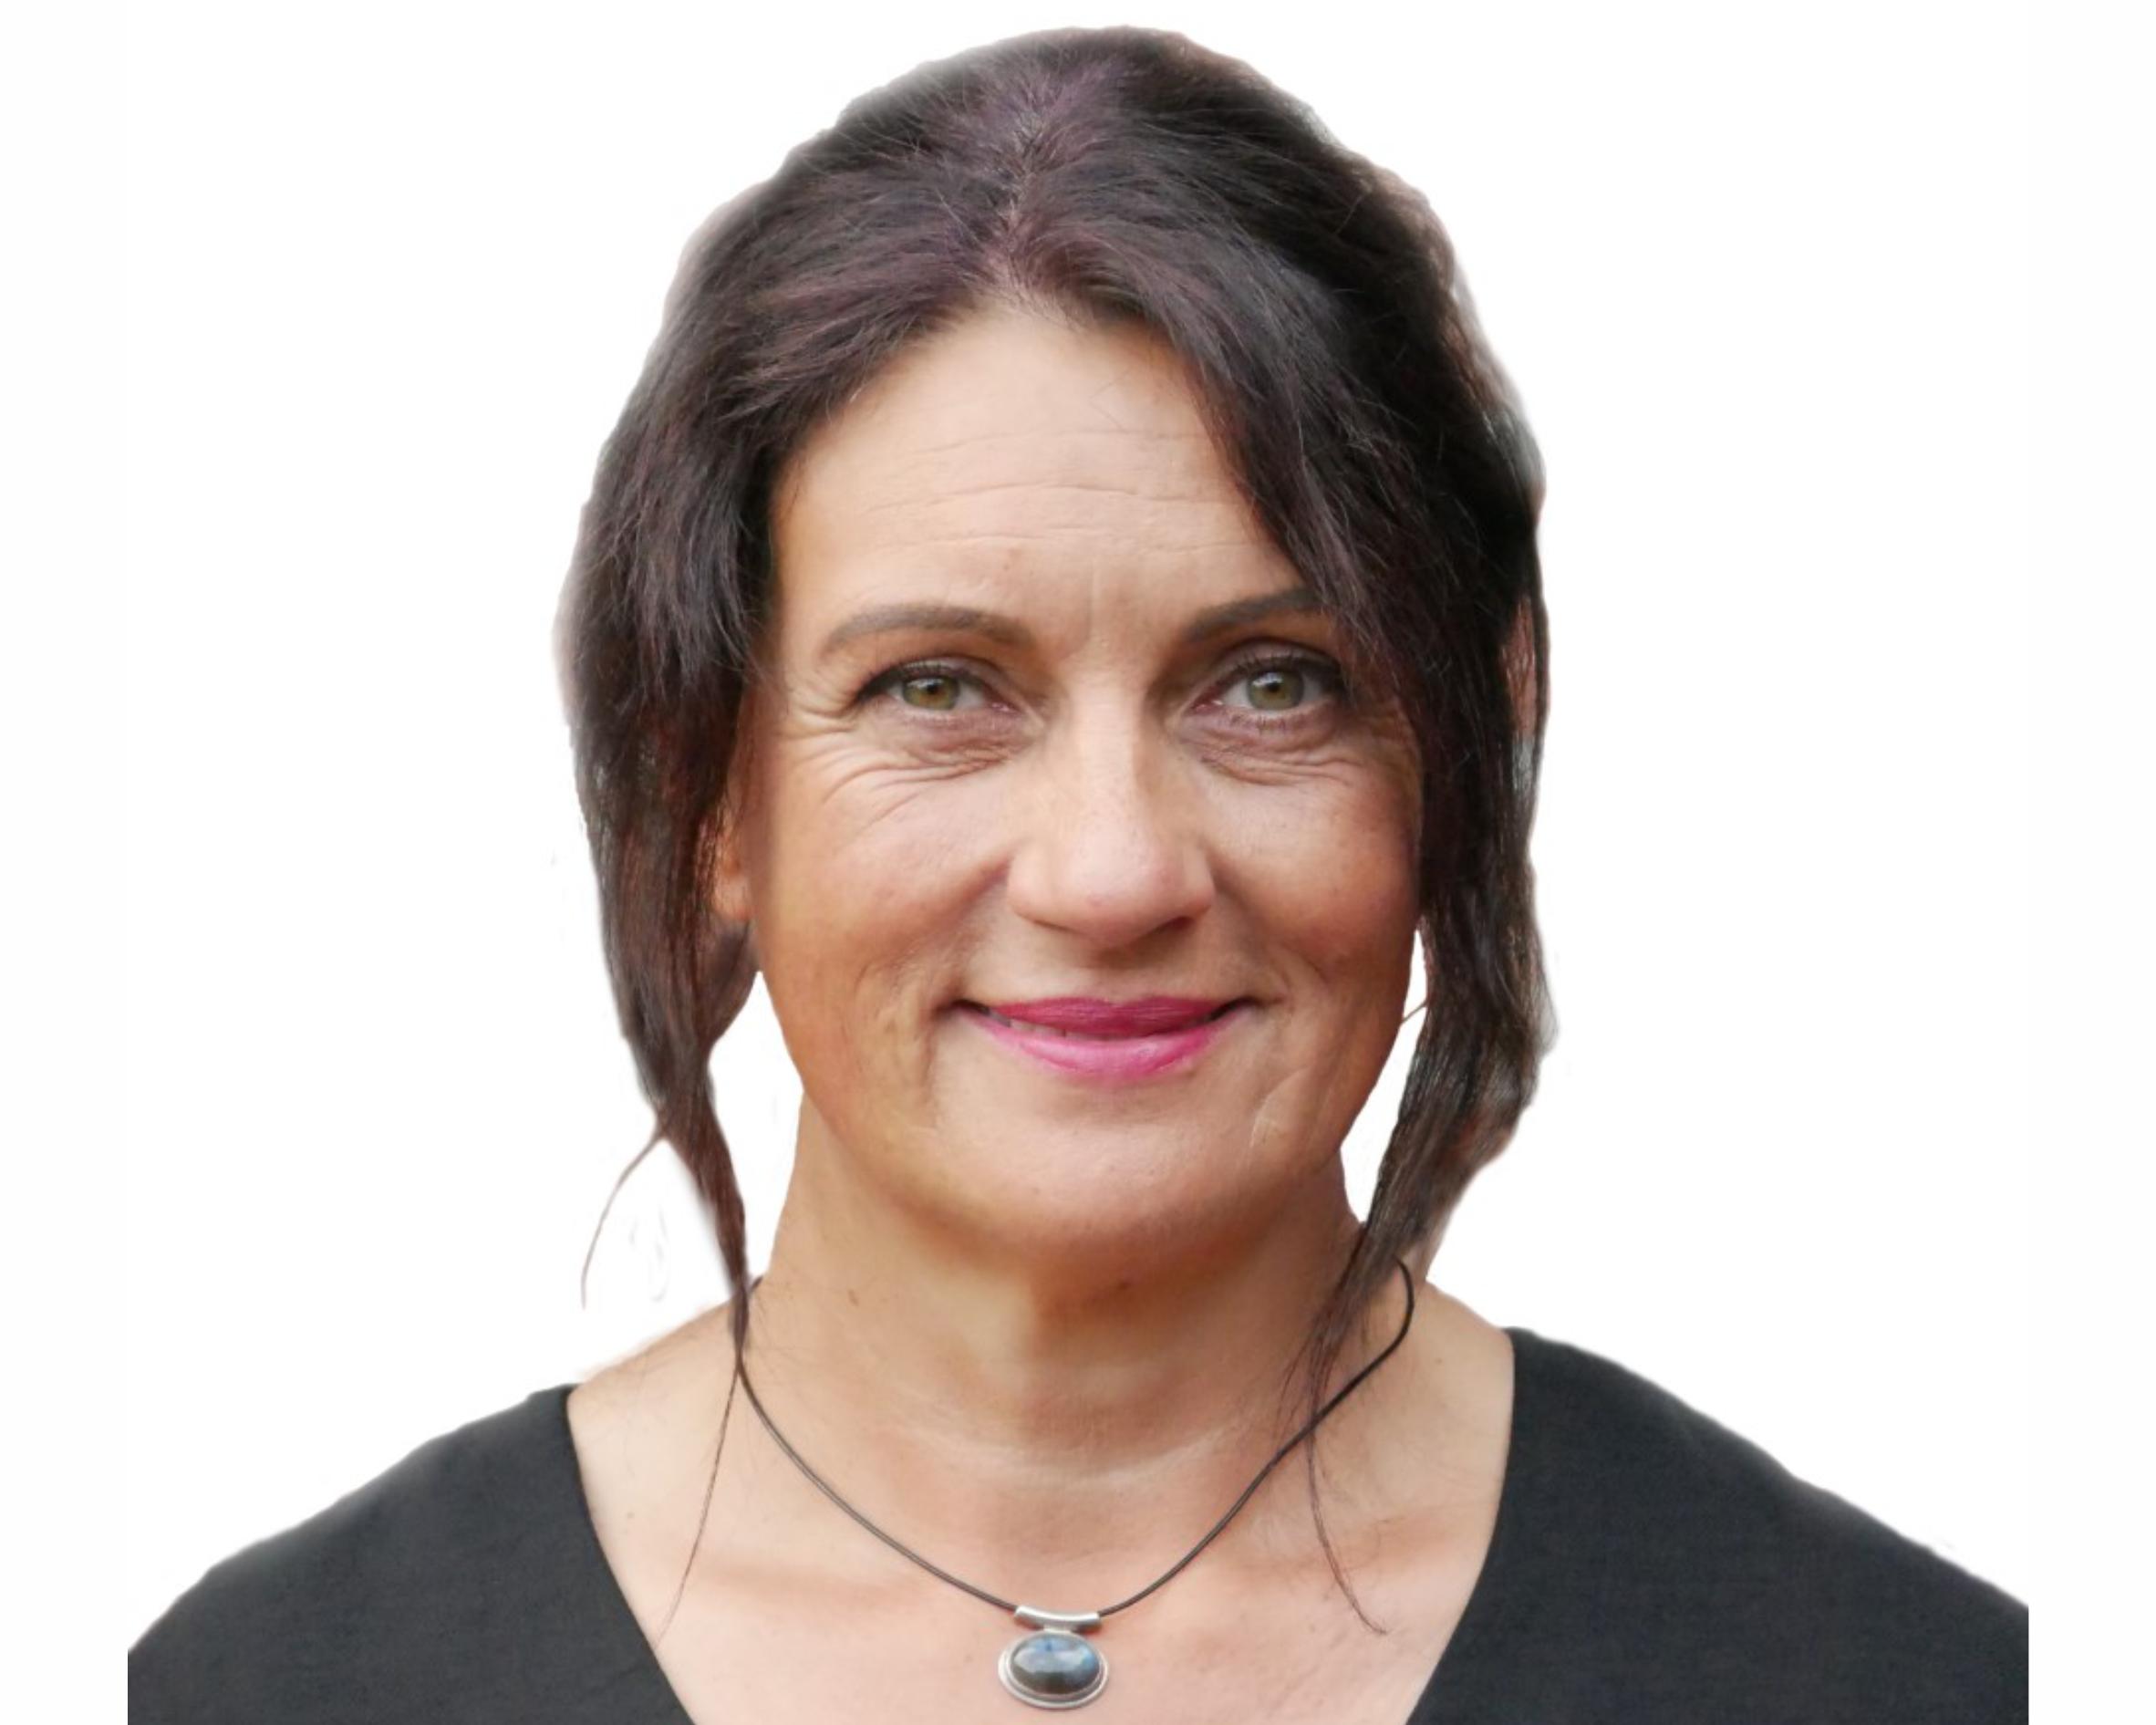 Nicole Sroka Marketing Kommunikation NFaktuell Achtsamkeit Coaching